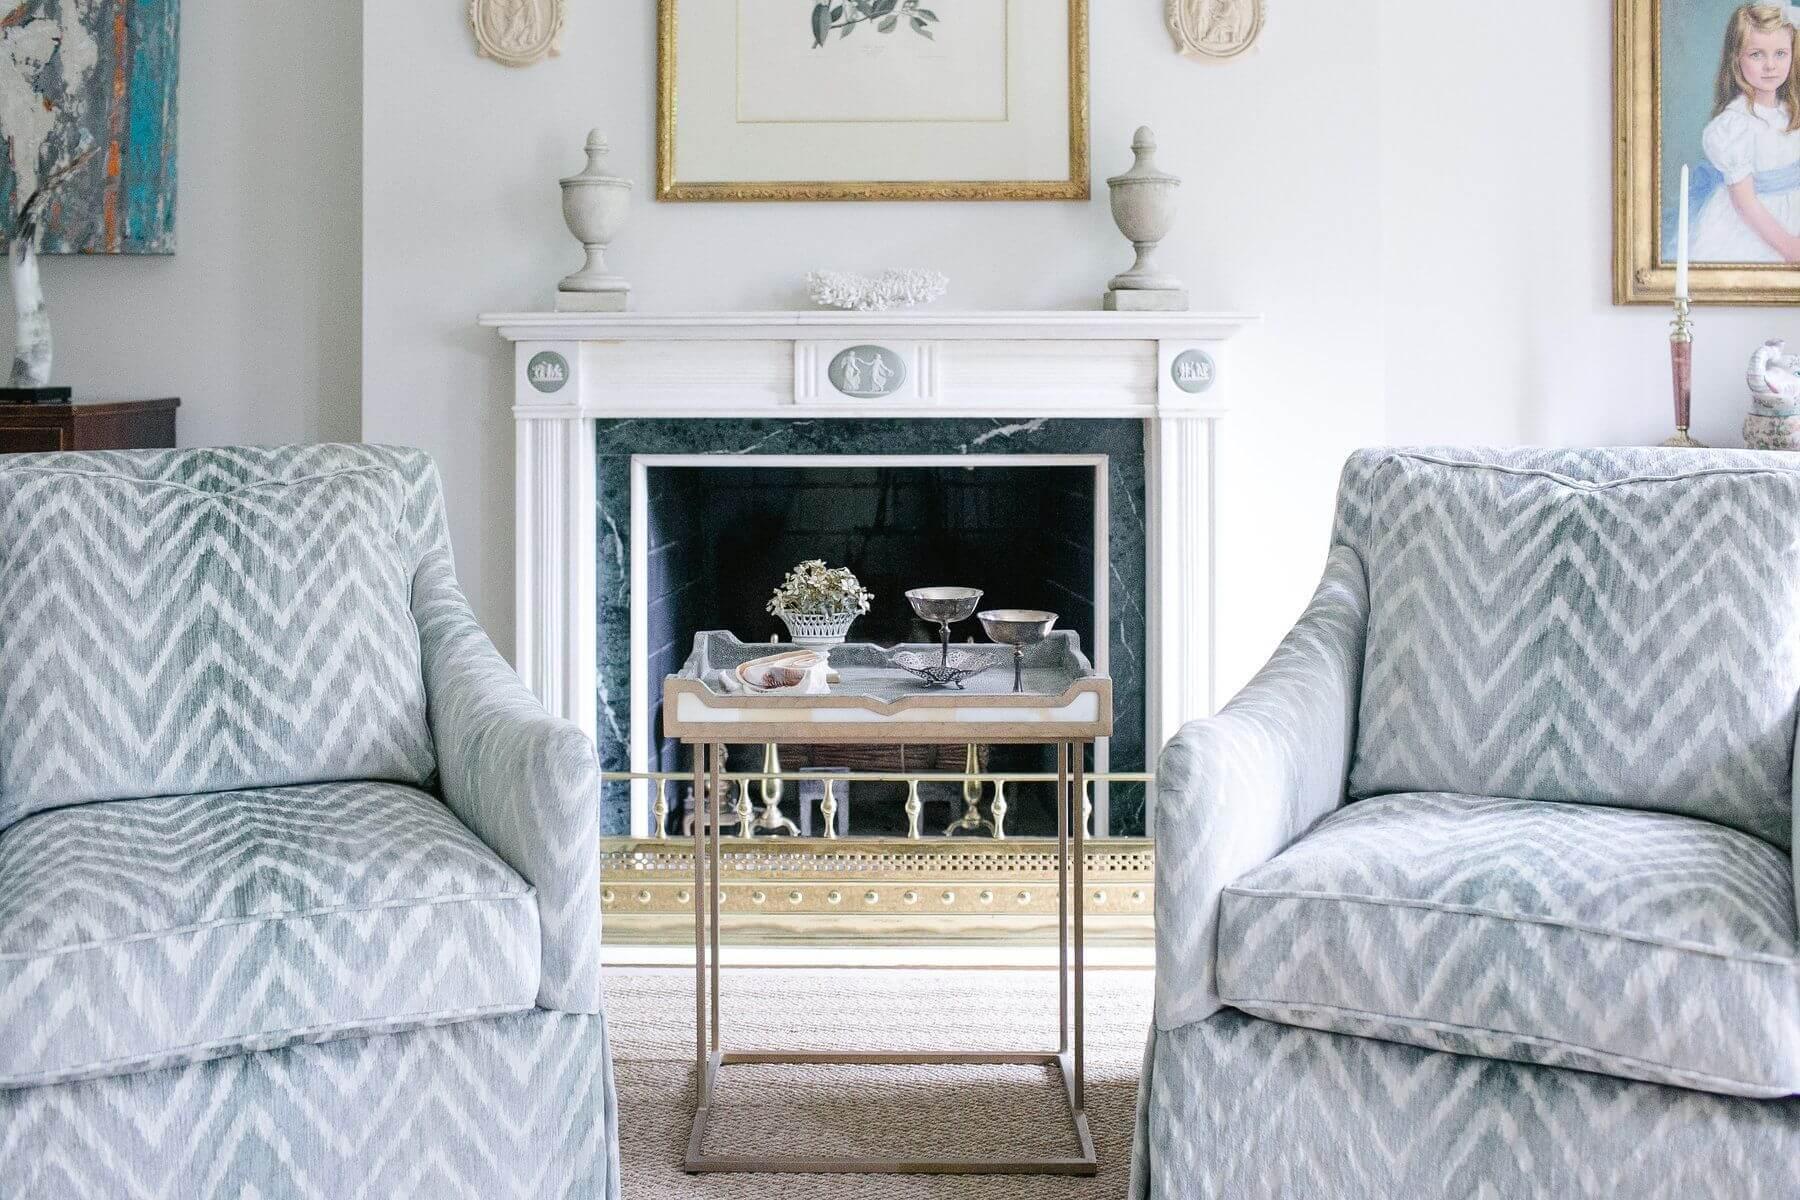 Check out this interior design duo! © Q Avenue Photo